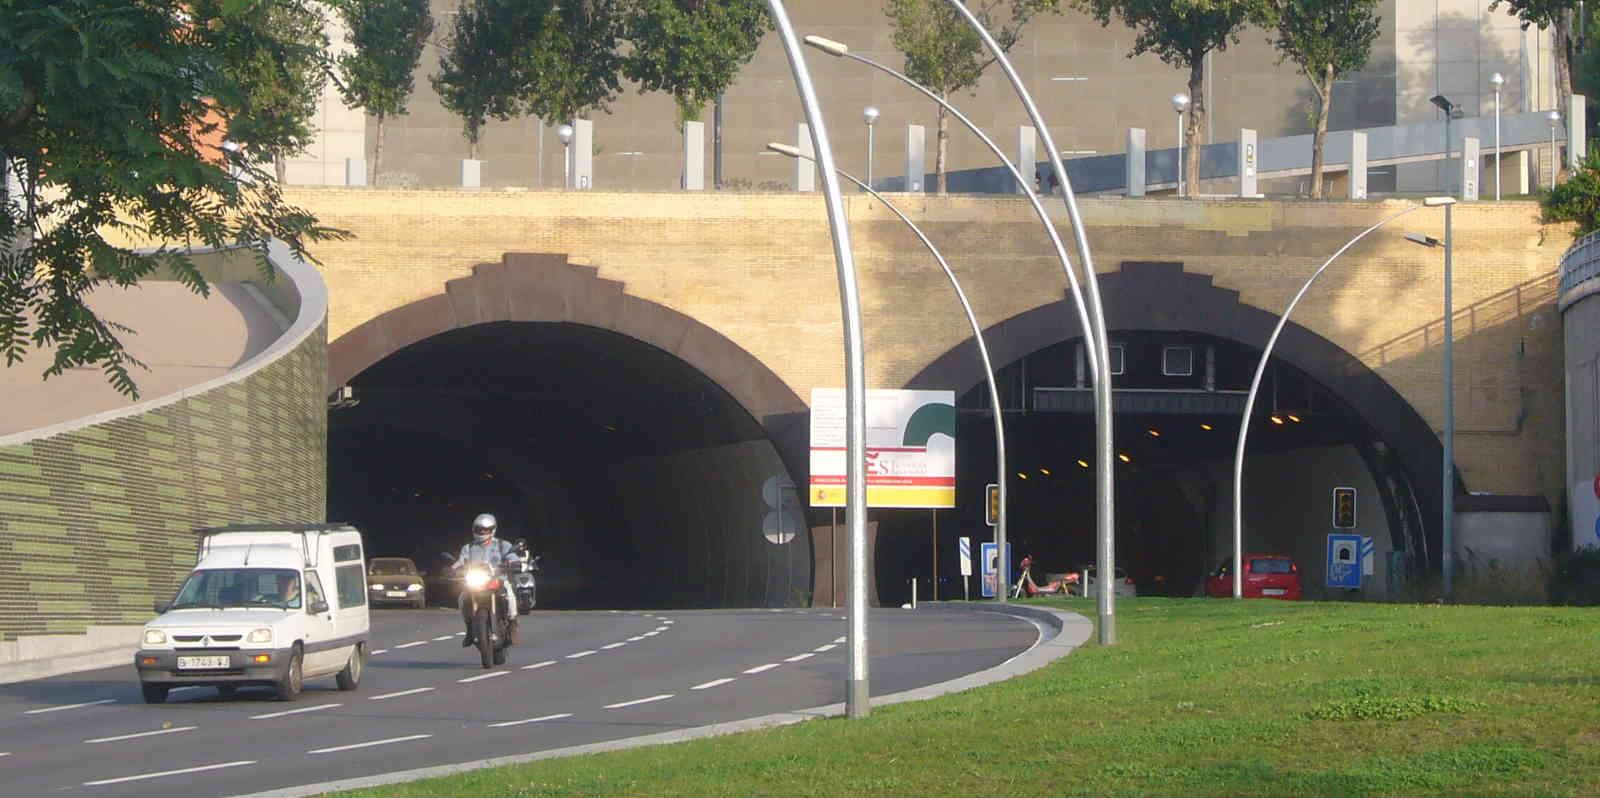 Uno de los túneles urbanos de Barcelona, el de la Rovira (Foto: Jordi Ferrer / Wikimedia Commons)